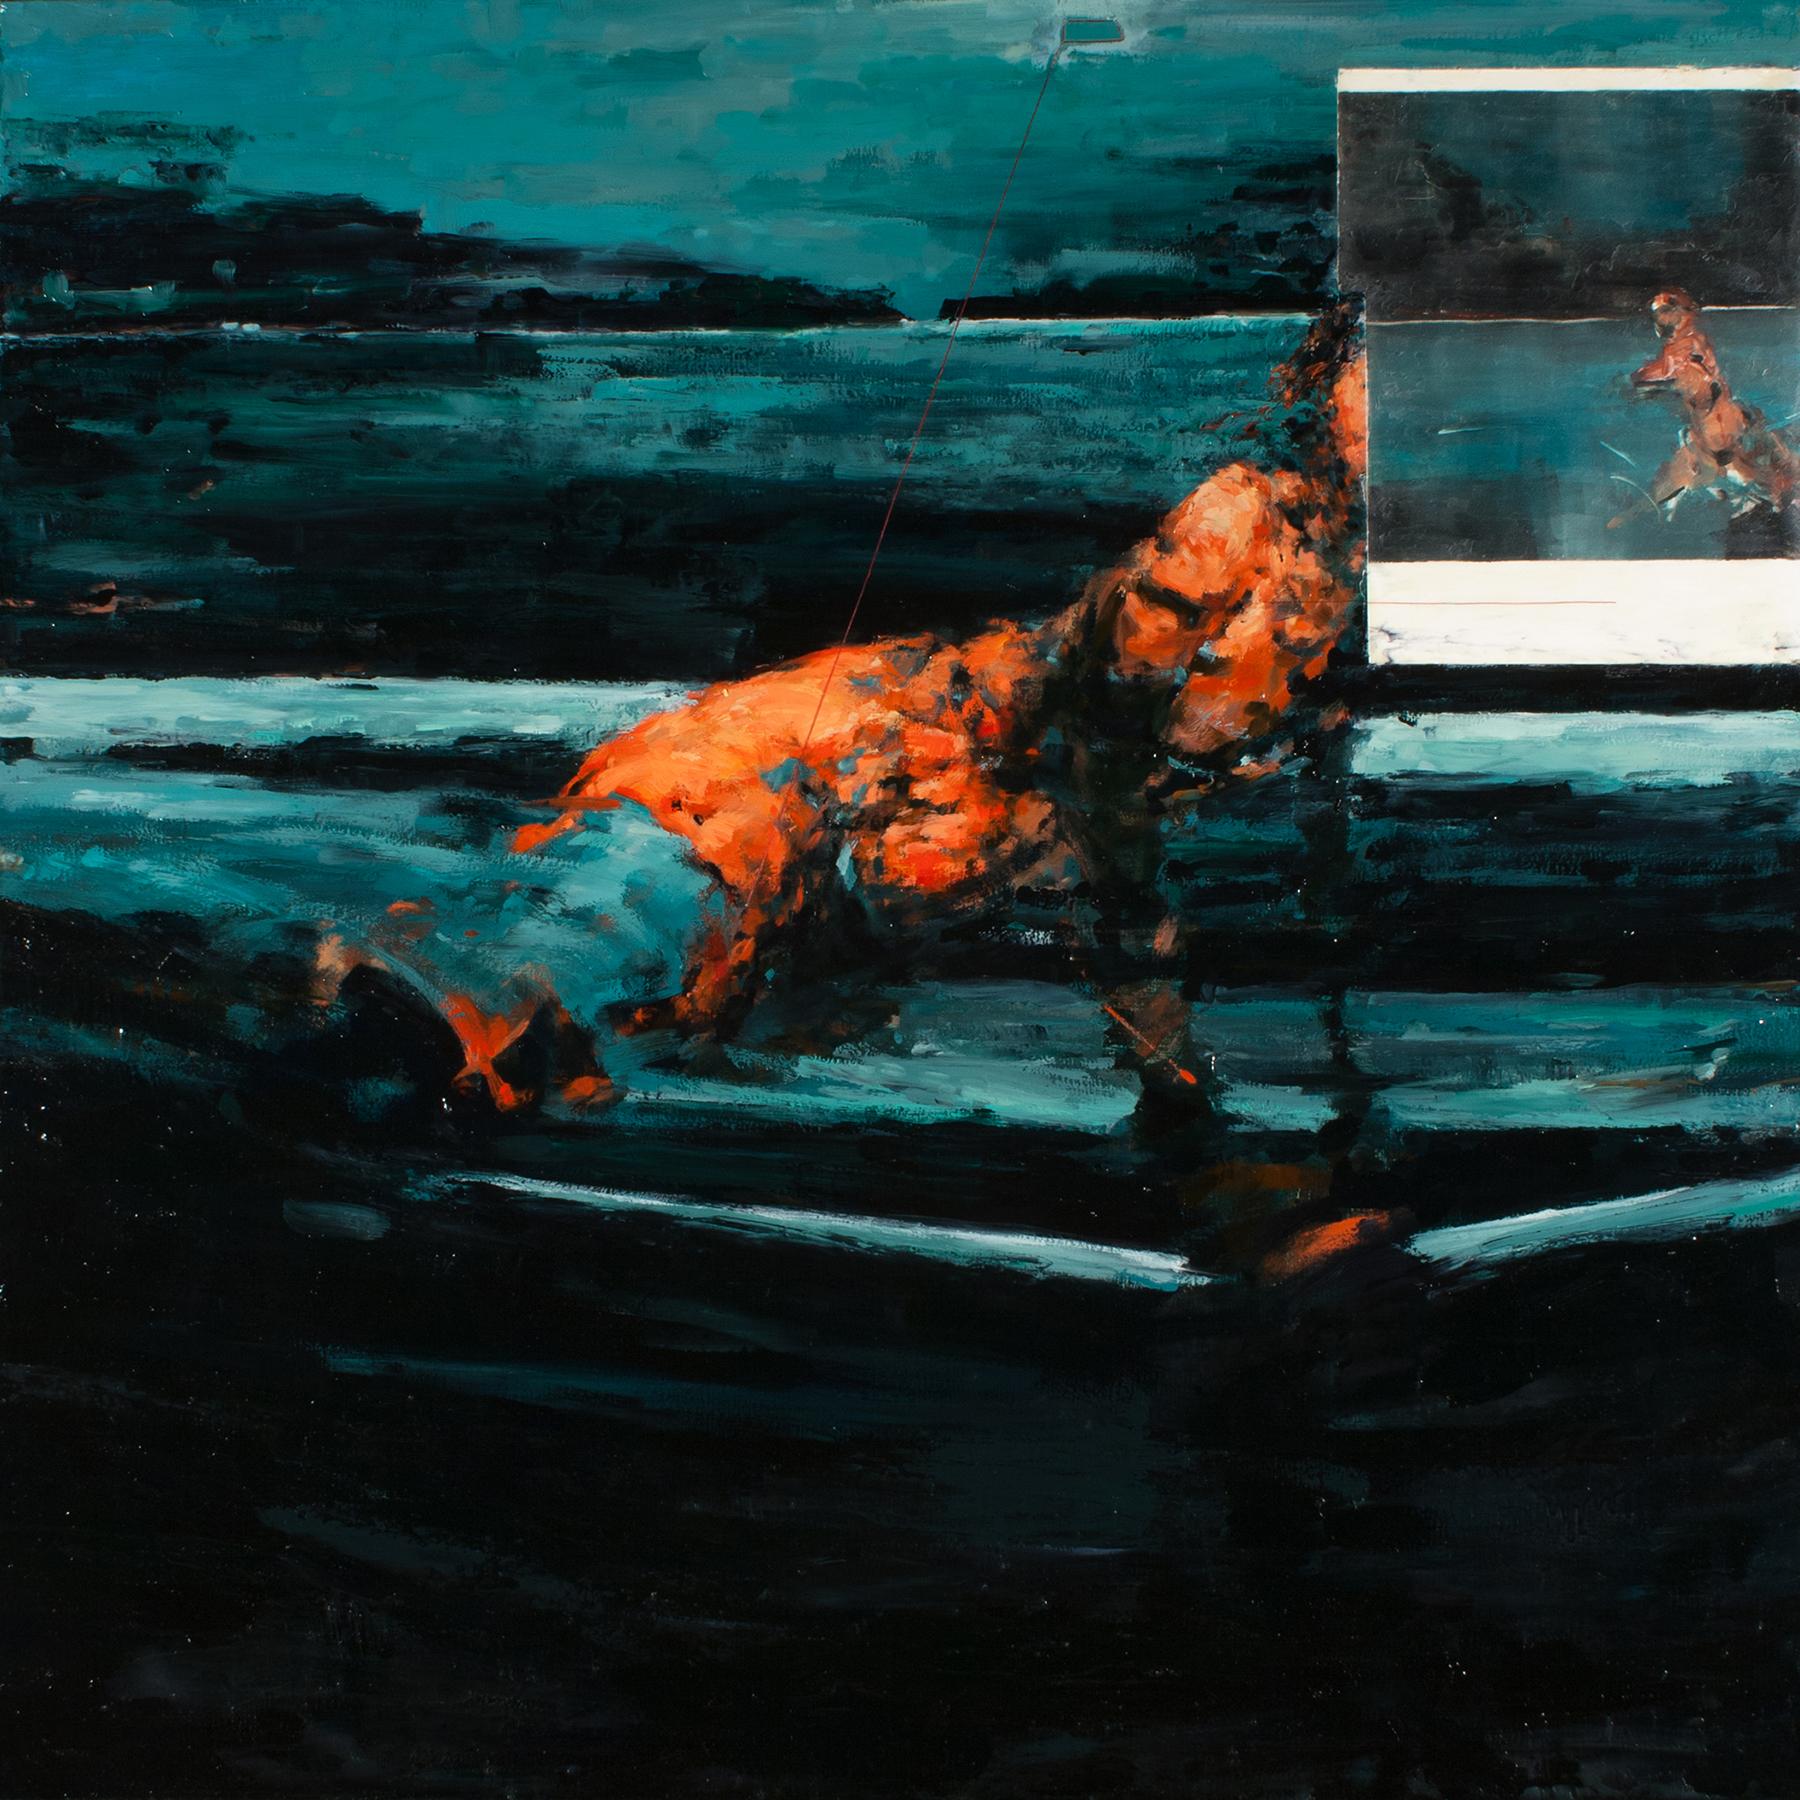 "Crux (redux), oil, wax, thread, monotype on canvas, 42"" x 42"" x 2"", 2014"